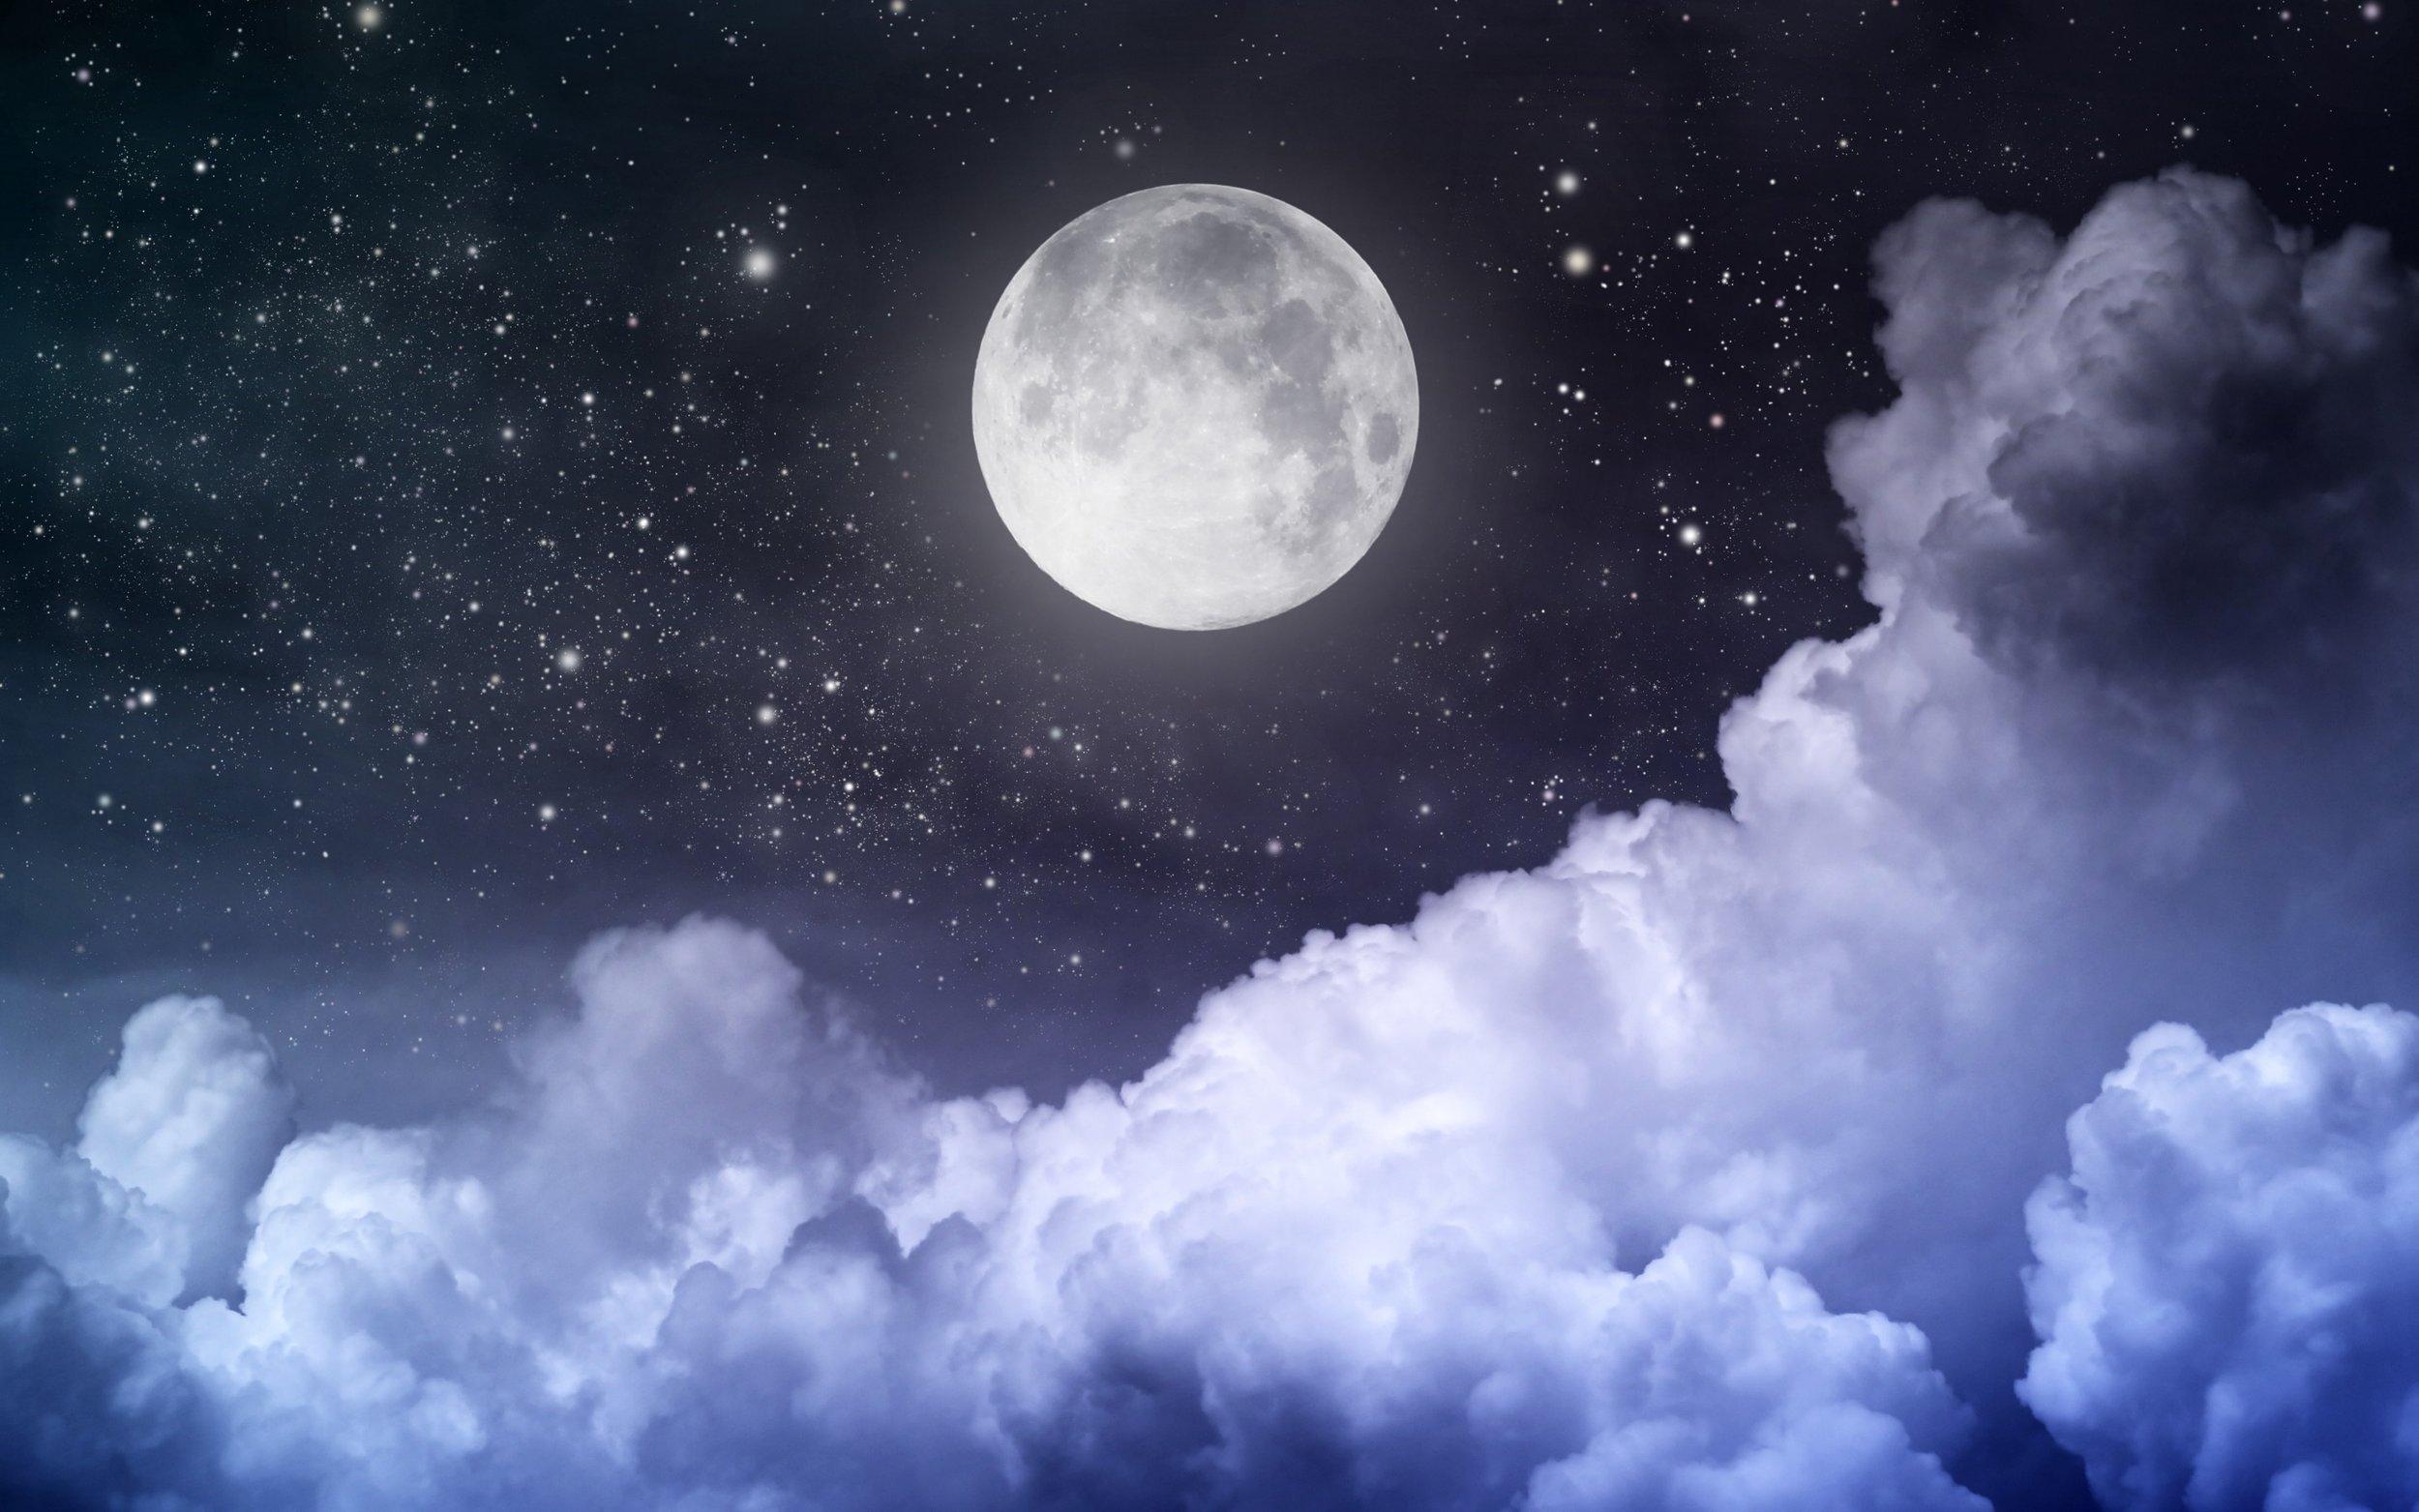 10912_moon-moonl.jpg